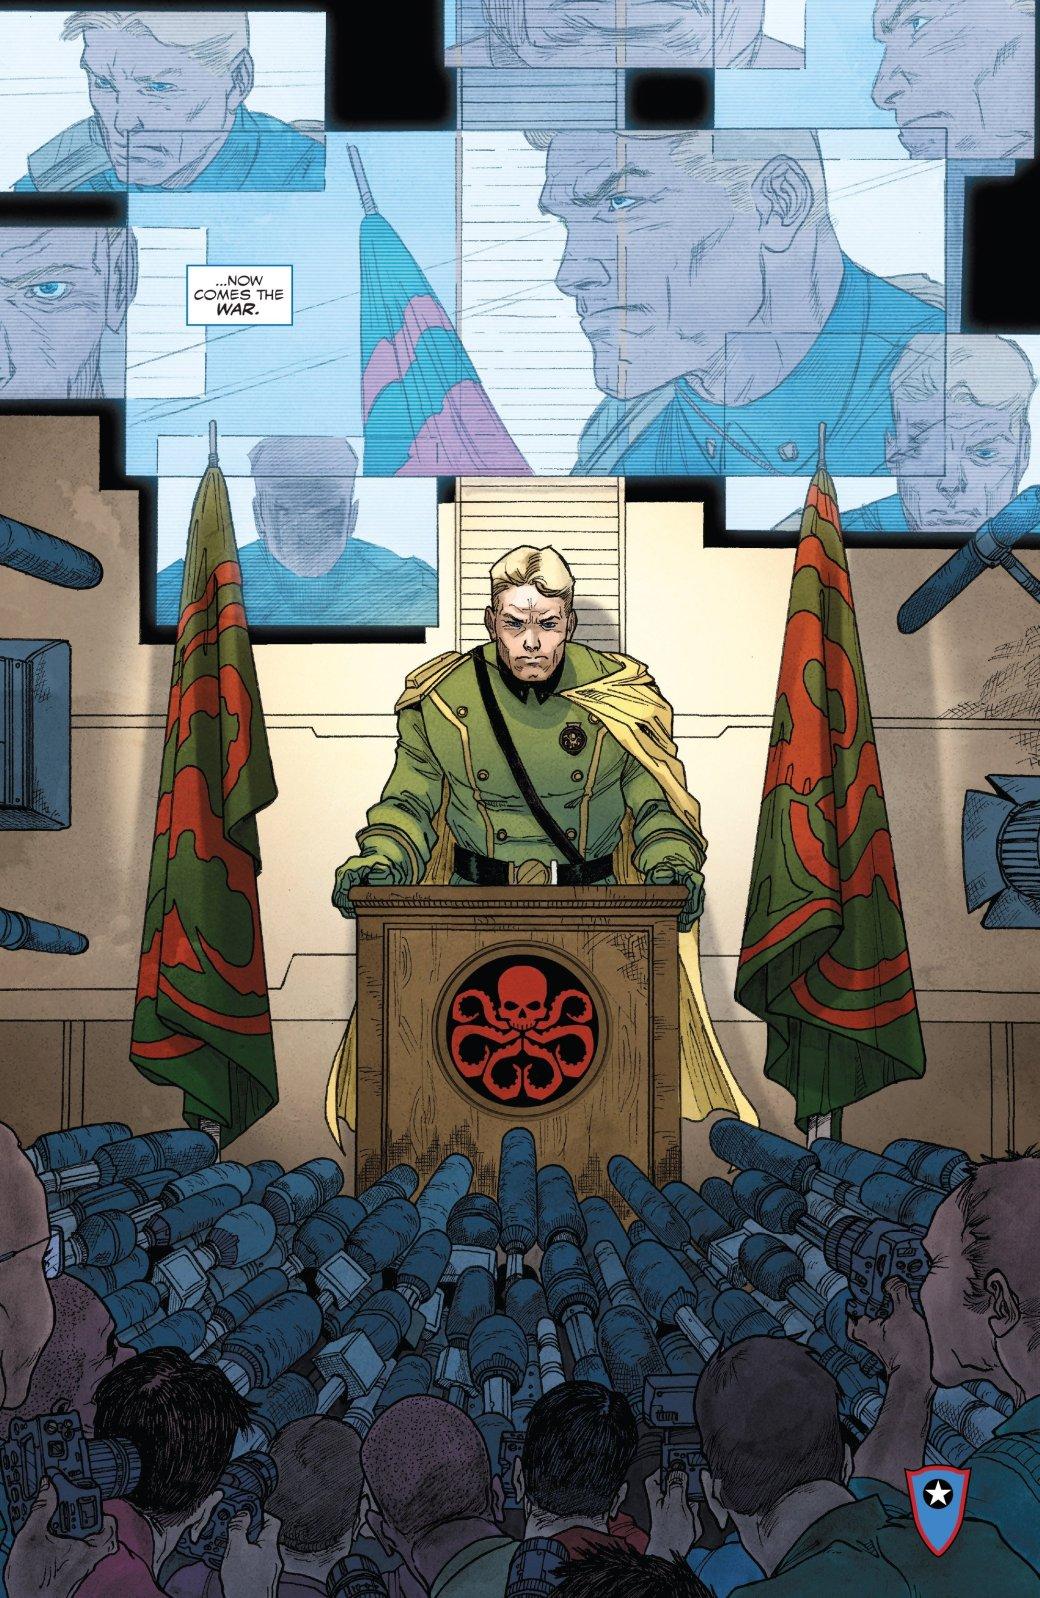 Secret Empire приближается кконцу: Гидра объявила войну Ваканде